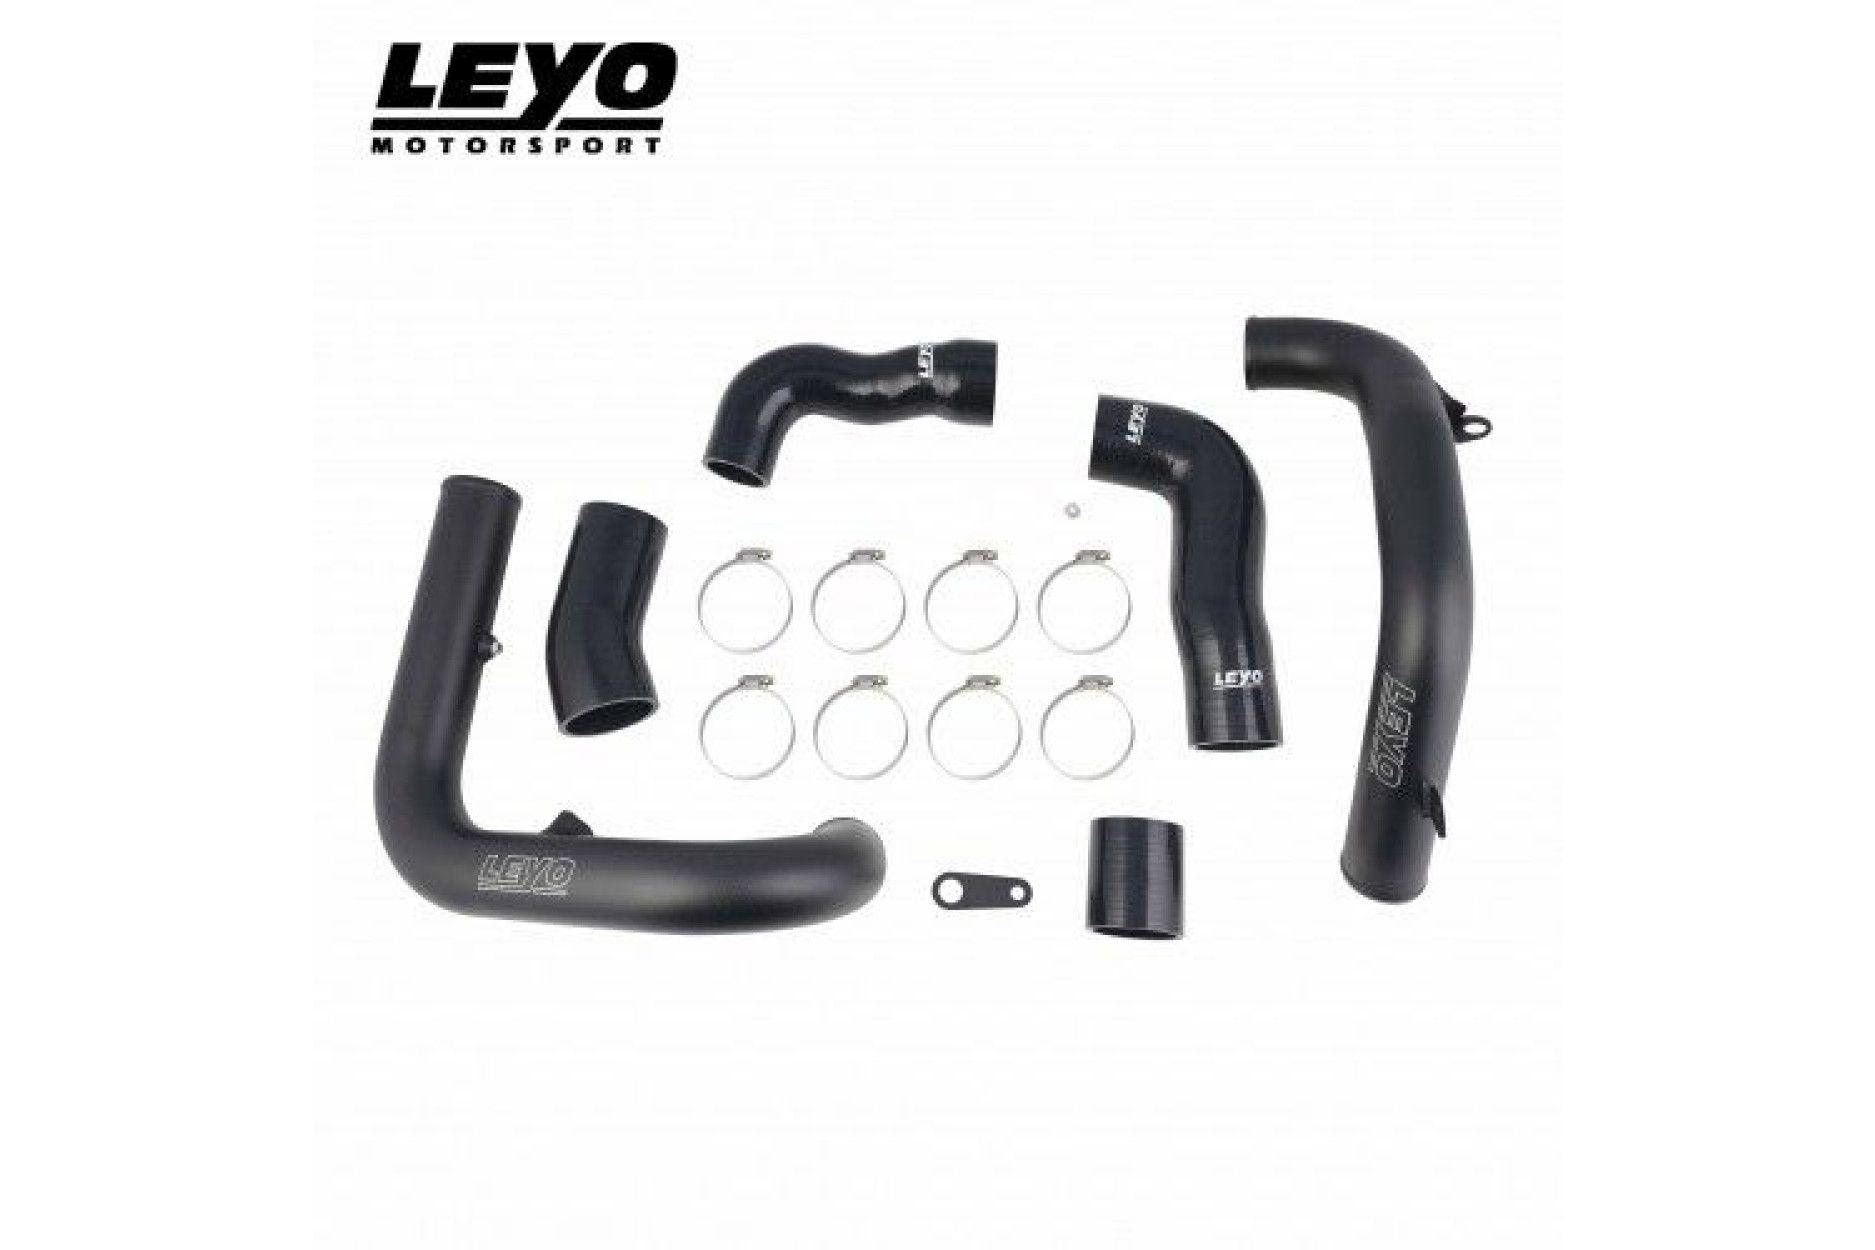 Leyo Upgrade Chargepipes für VW Golf 7 R Facelift MK7.5